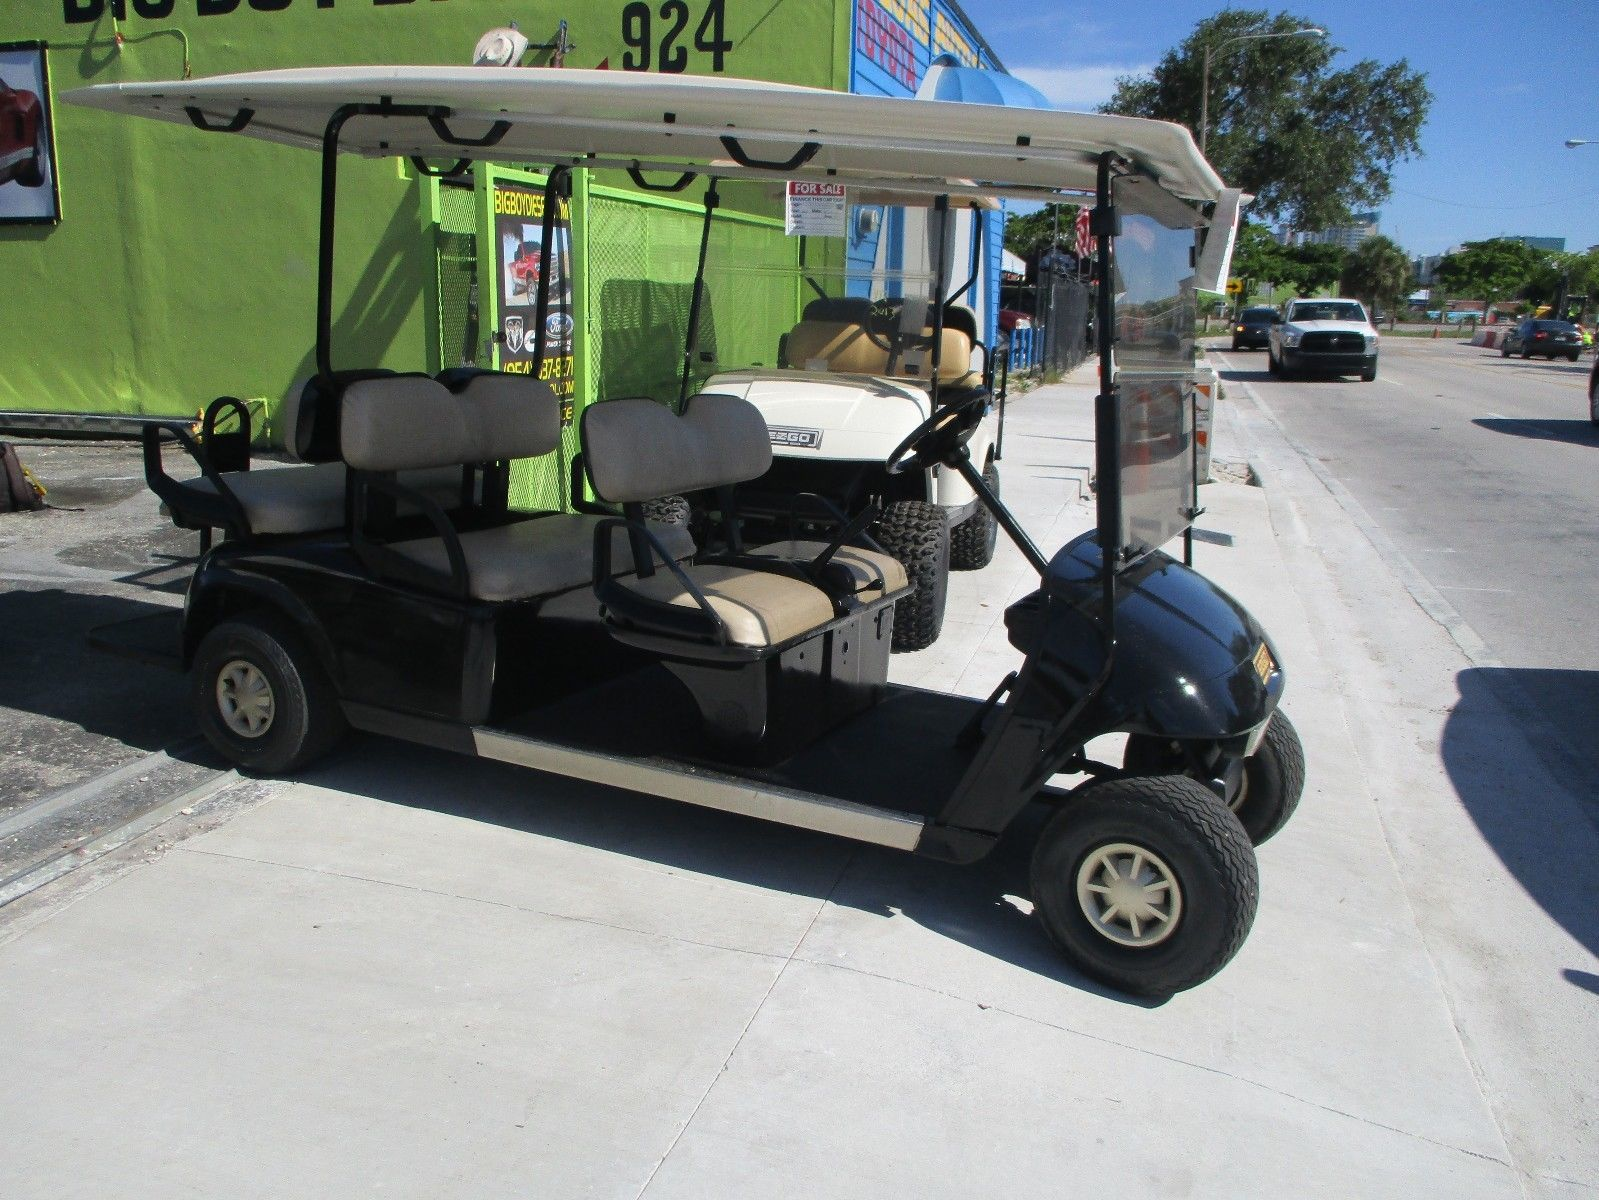 ez go ford f250 wiring diagram lights great runner 2013 golf cart 48 volt 6 passenger for sale